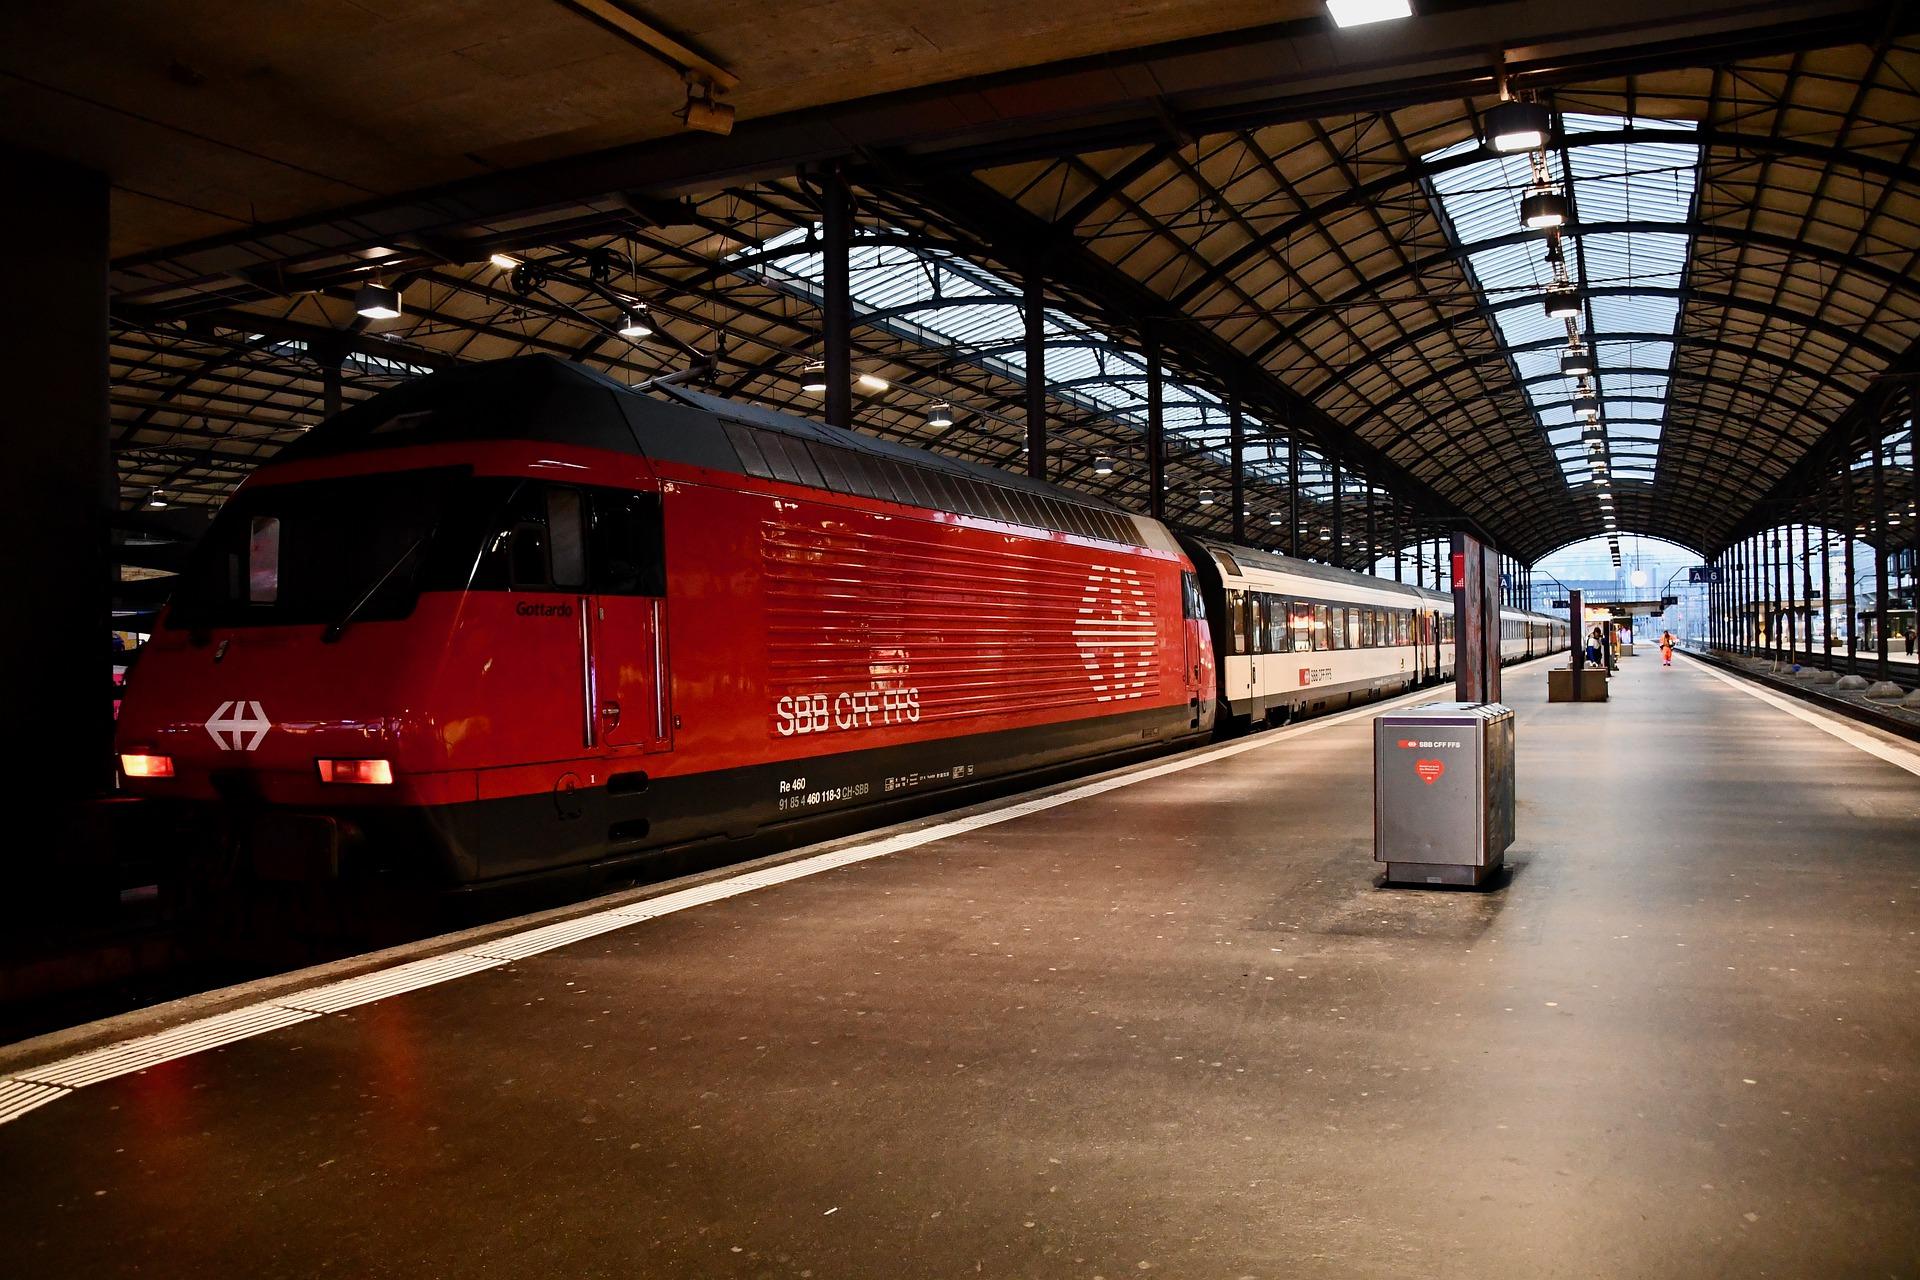 train-station-4987656_1920